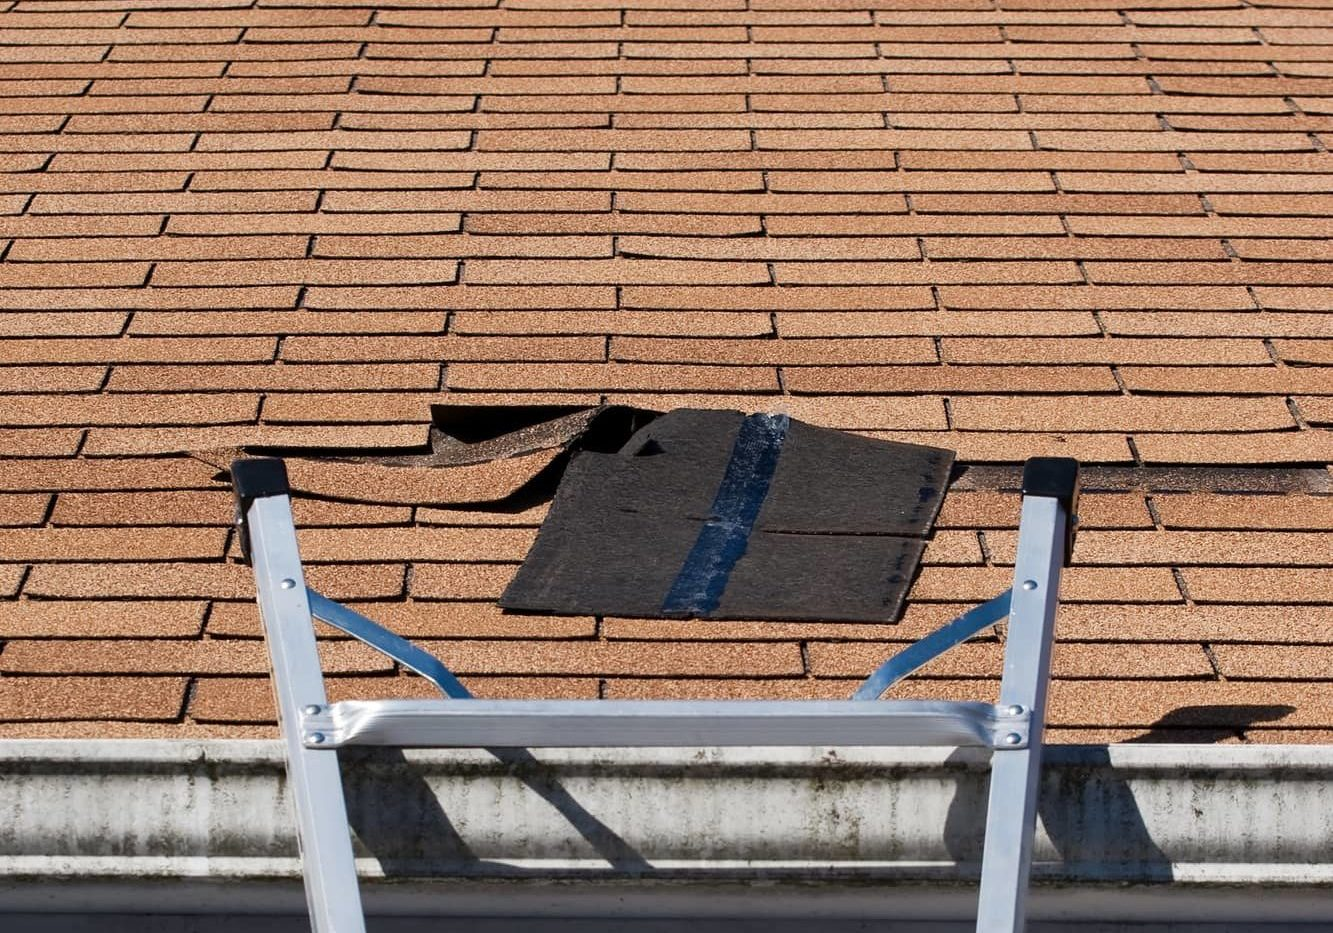 Greensboro Storm Damage Roofing Repair Contractors